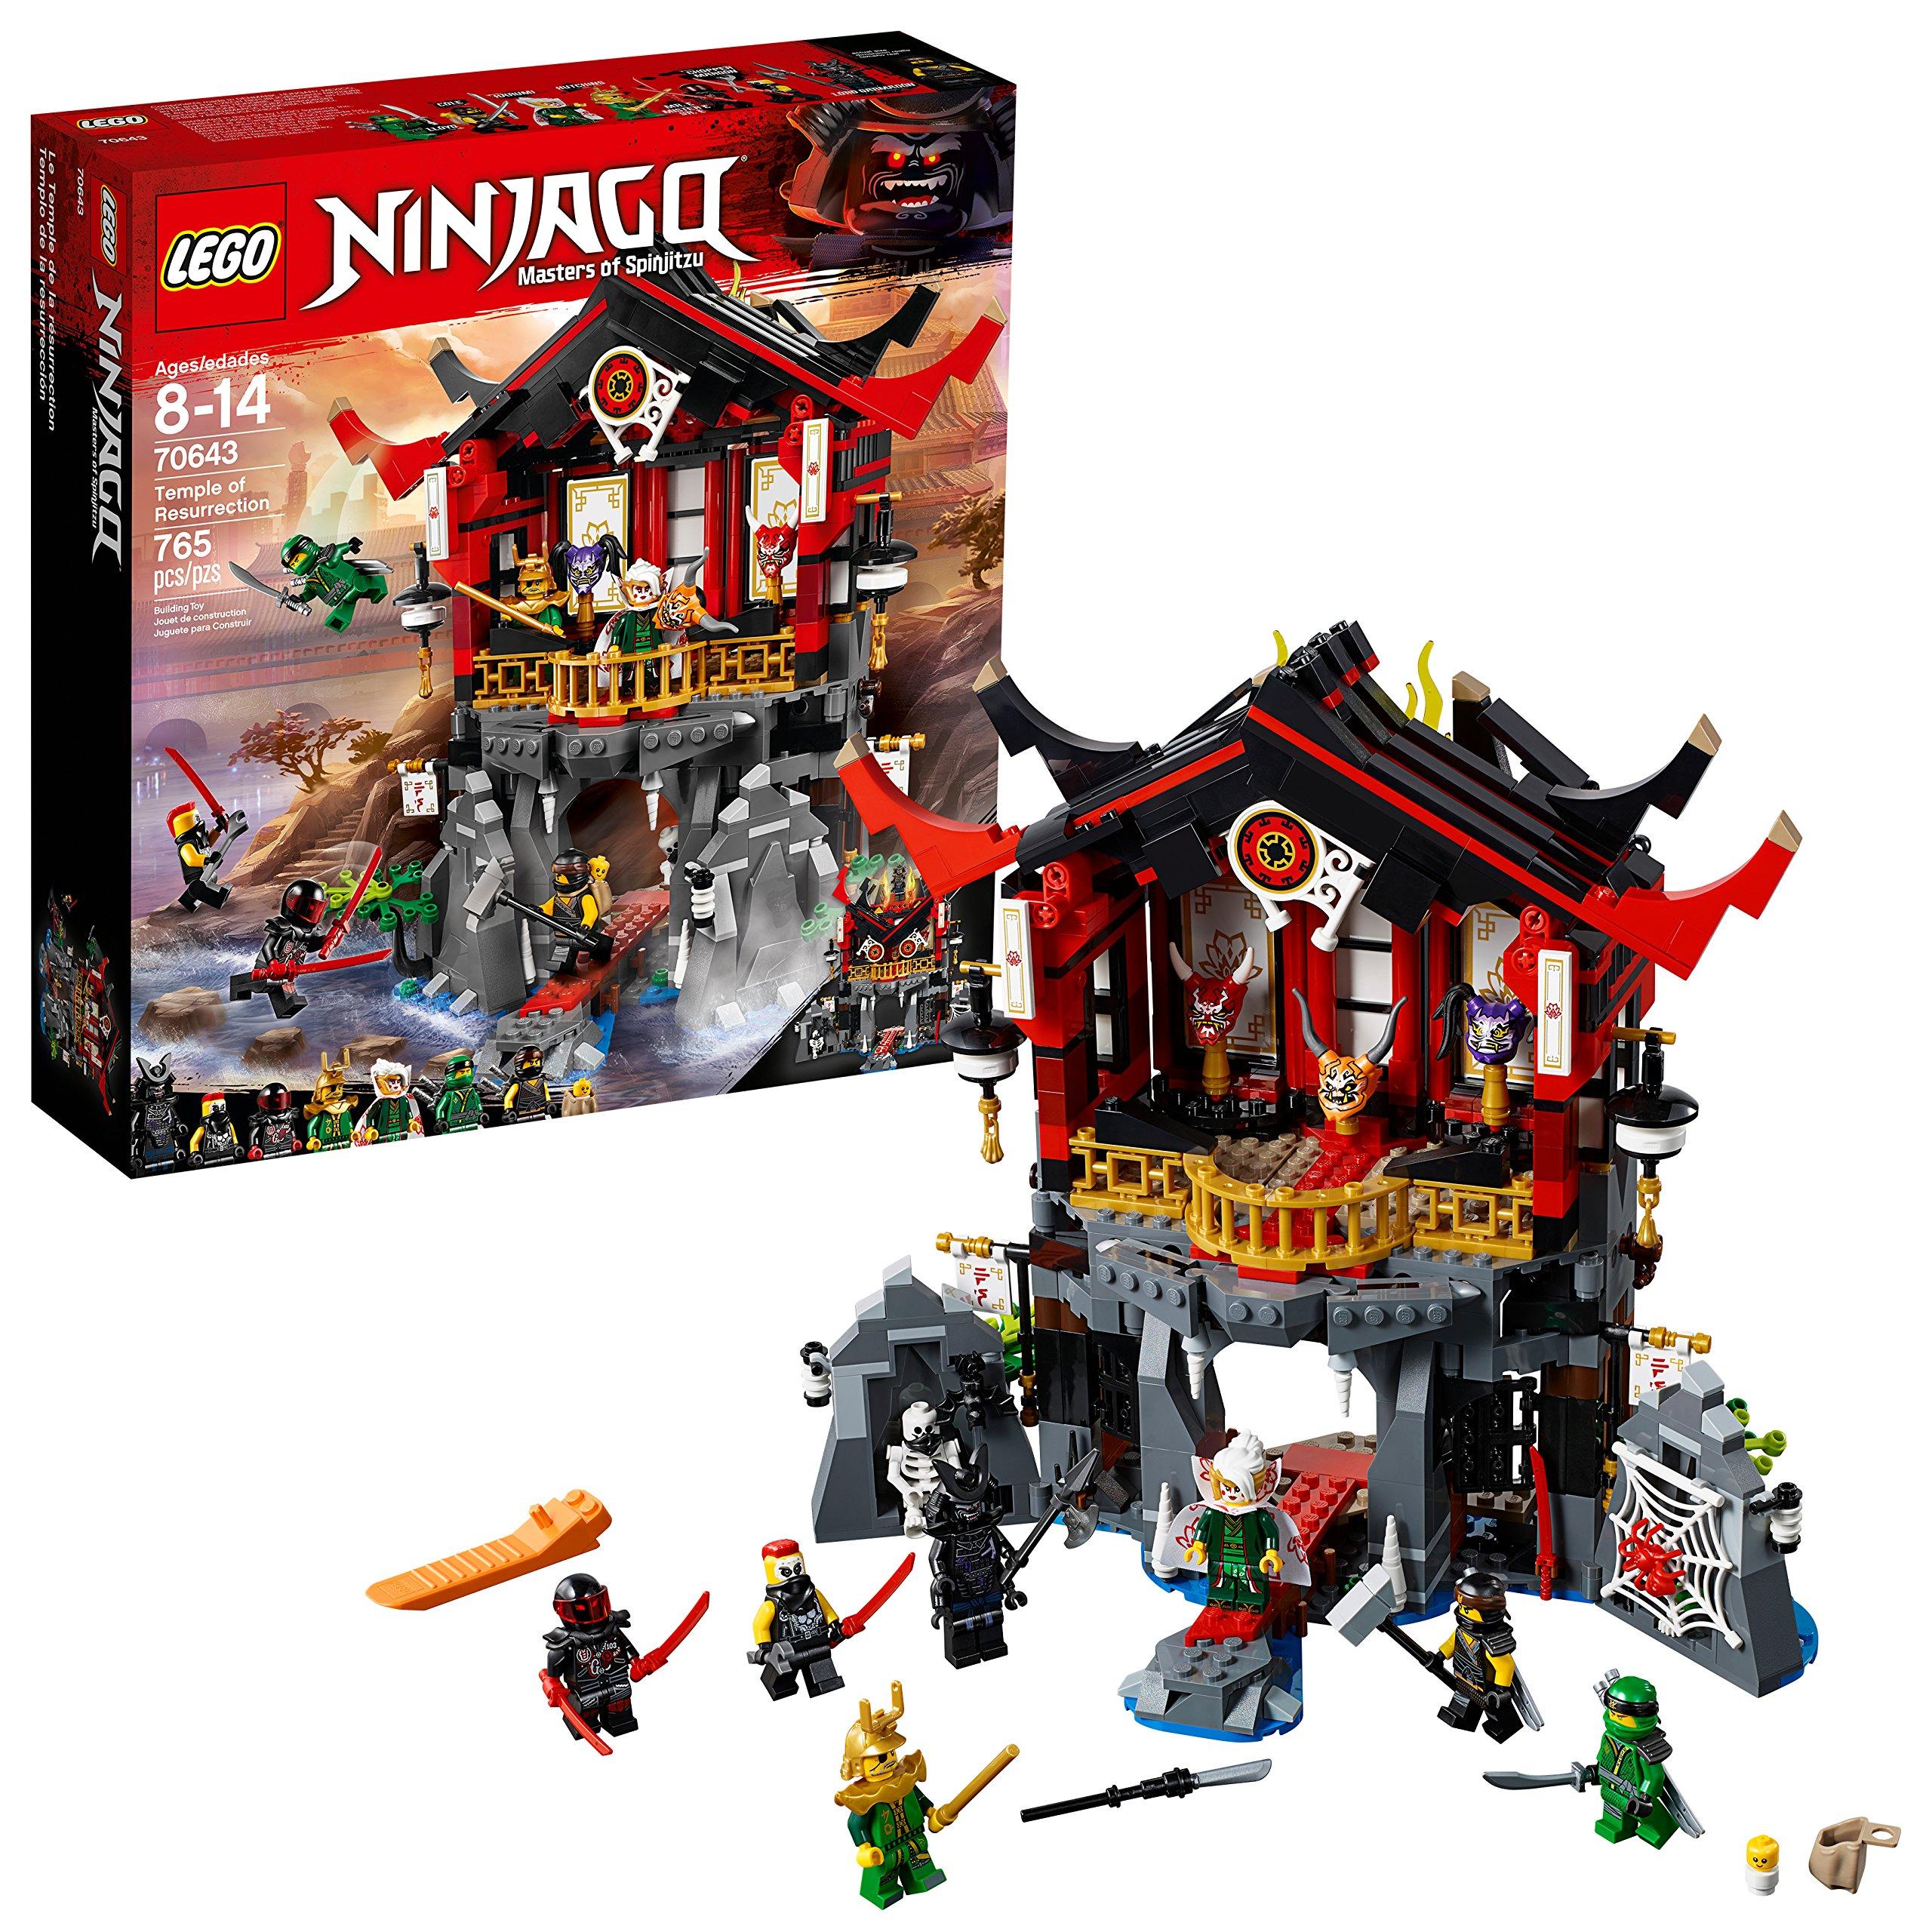 LEGO NINJAGO Temple of Resurrection 70643 Building Kit (765 Piece)